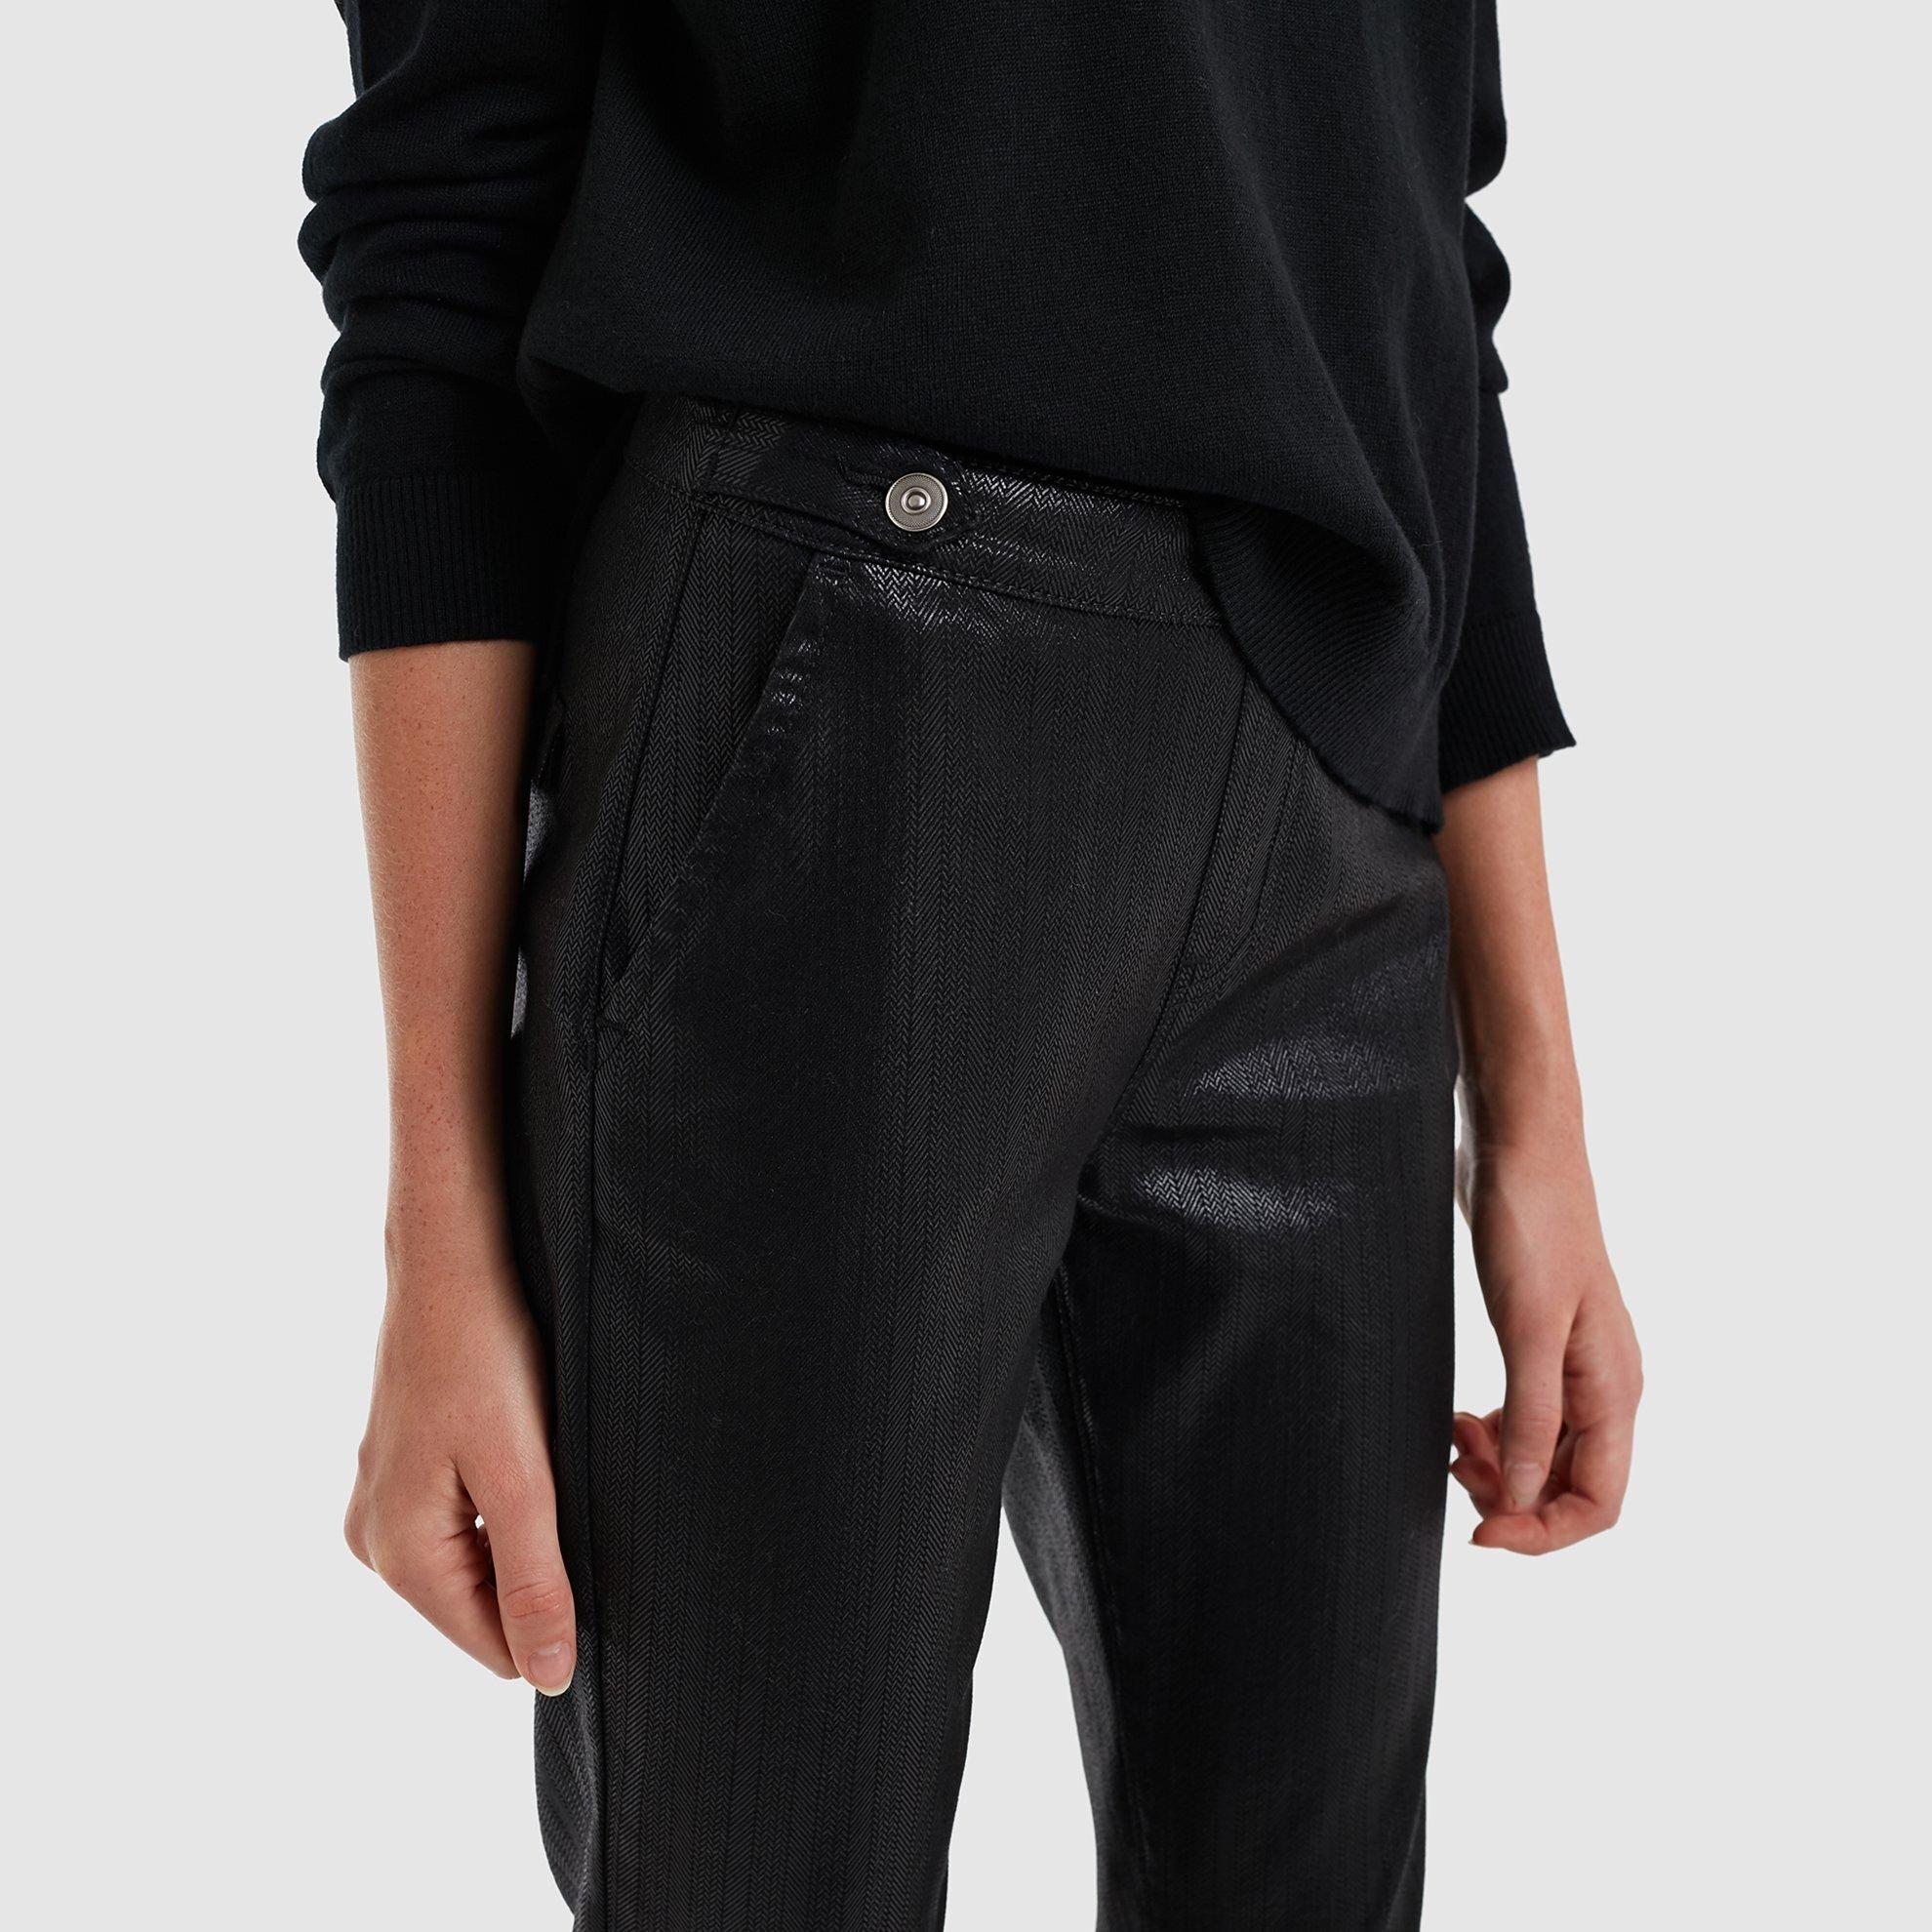 resm Kapaklı Cepli Kemer Detaylı Pantolon